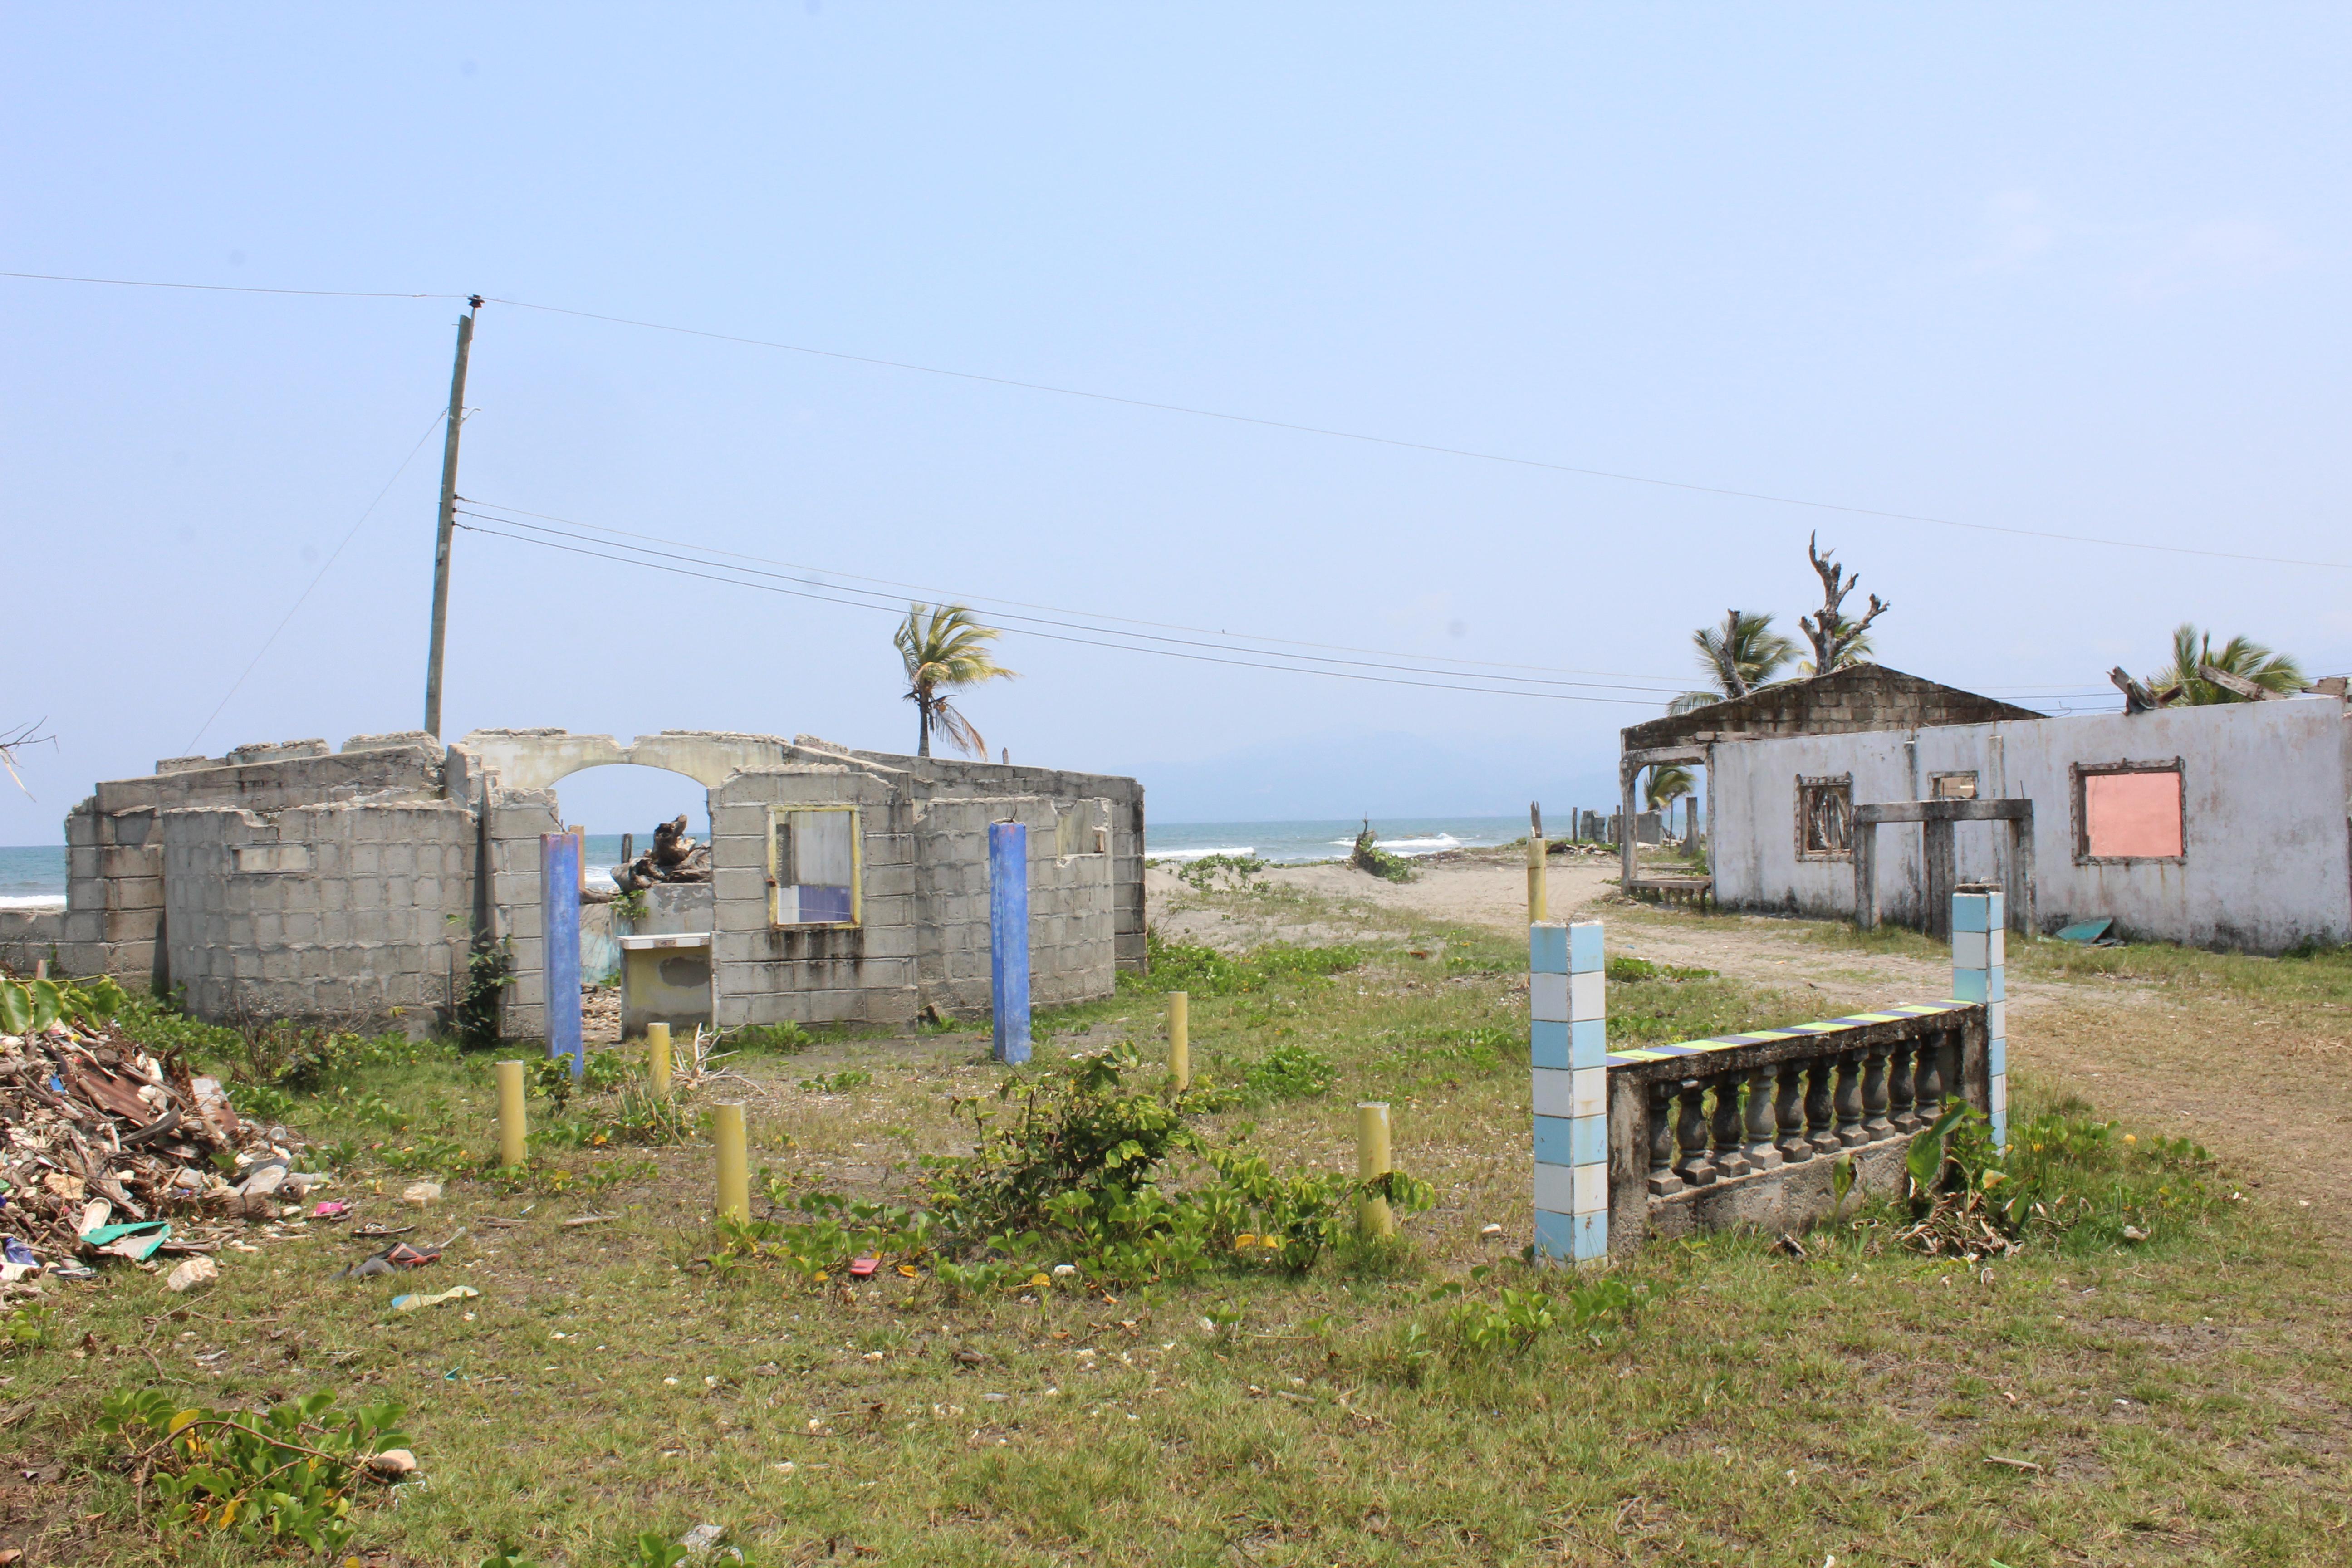 Climate change wrecks Honduran community, Canadian sounds alarm